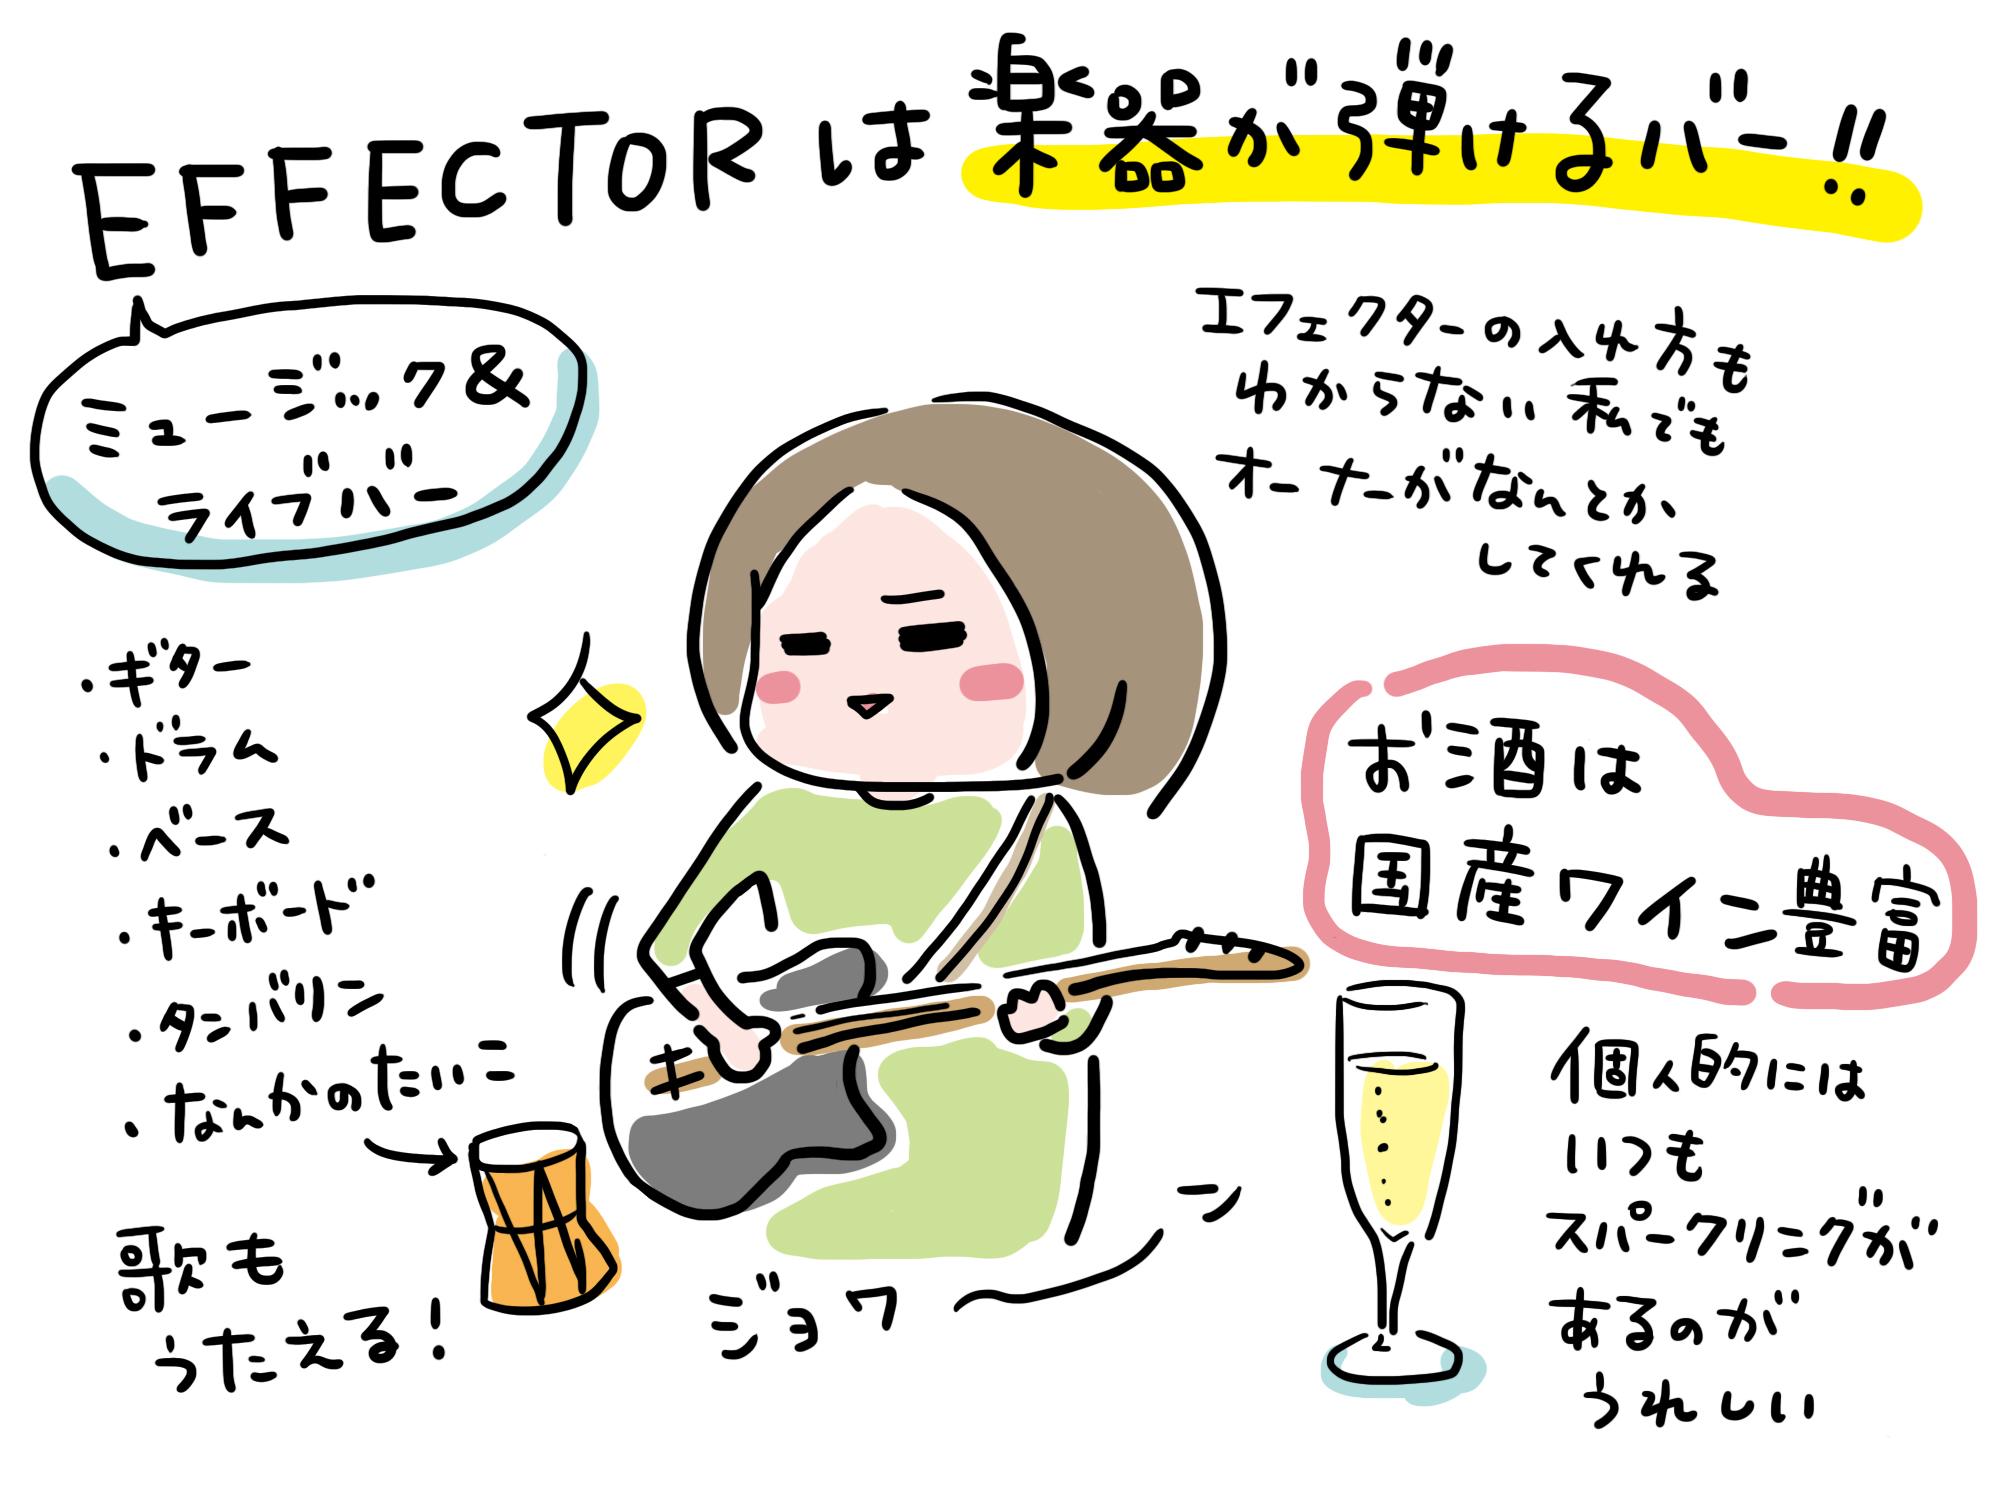 effectorは楽器が弾けるバー